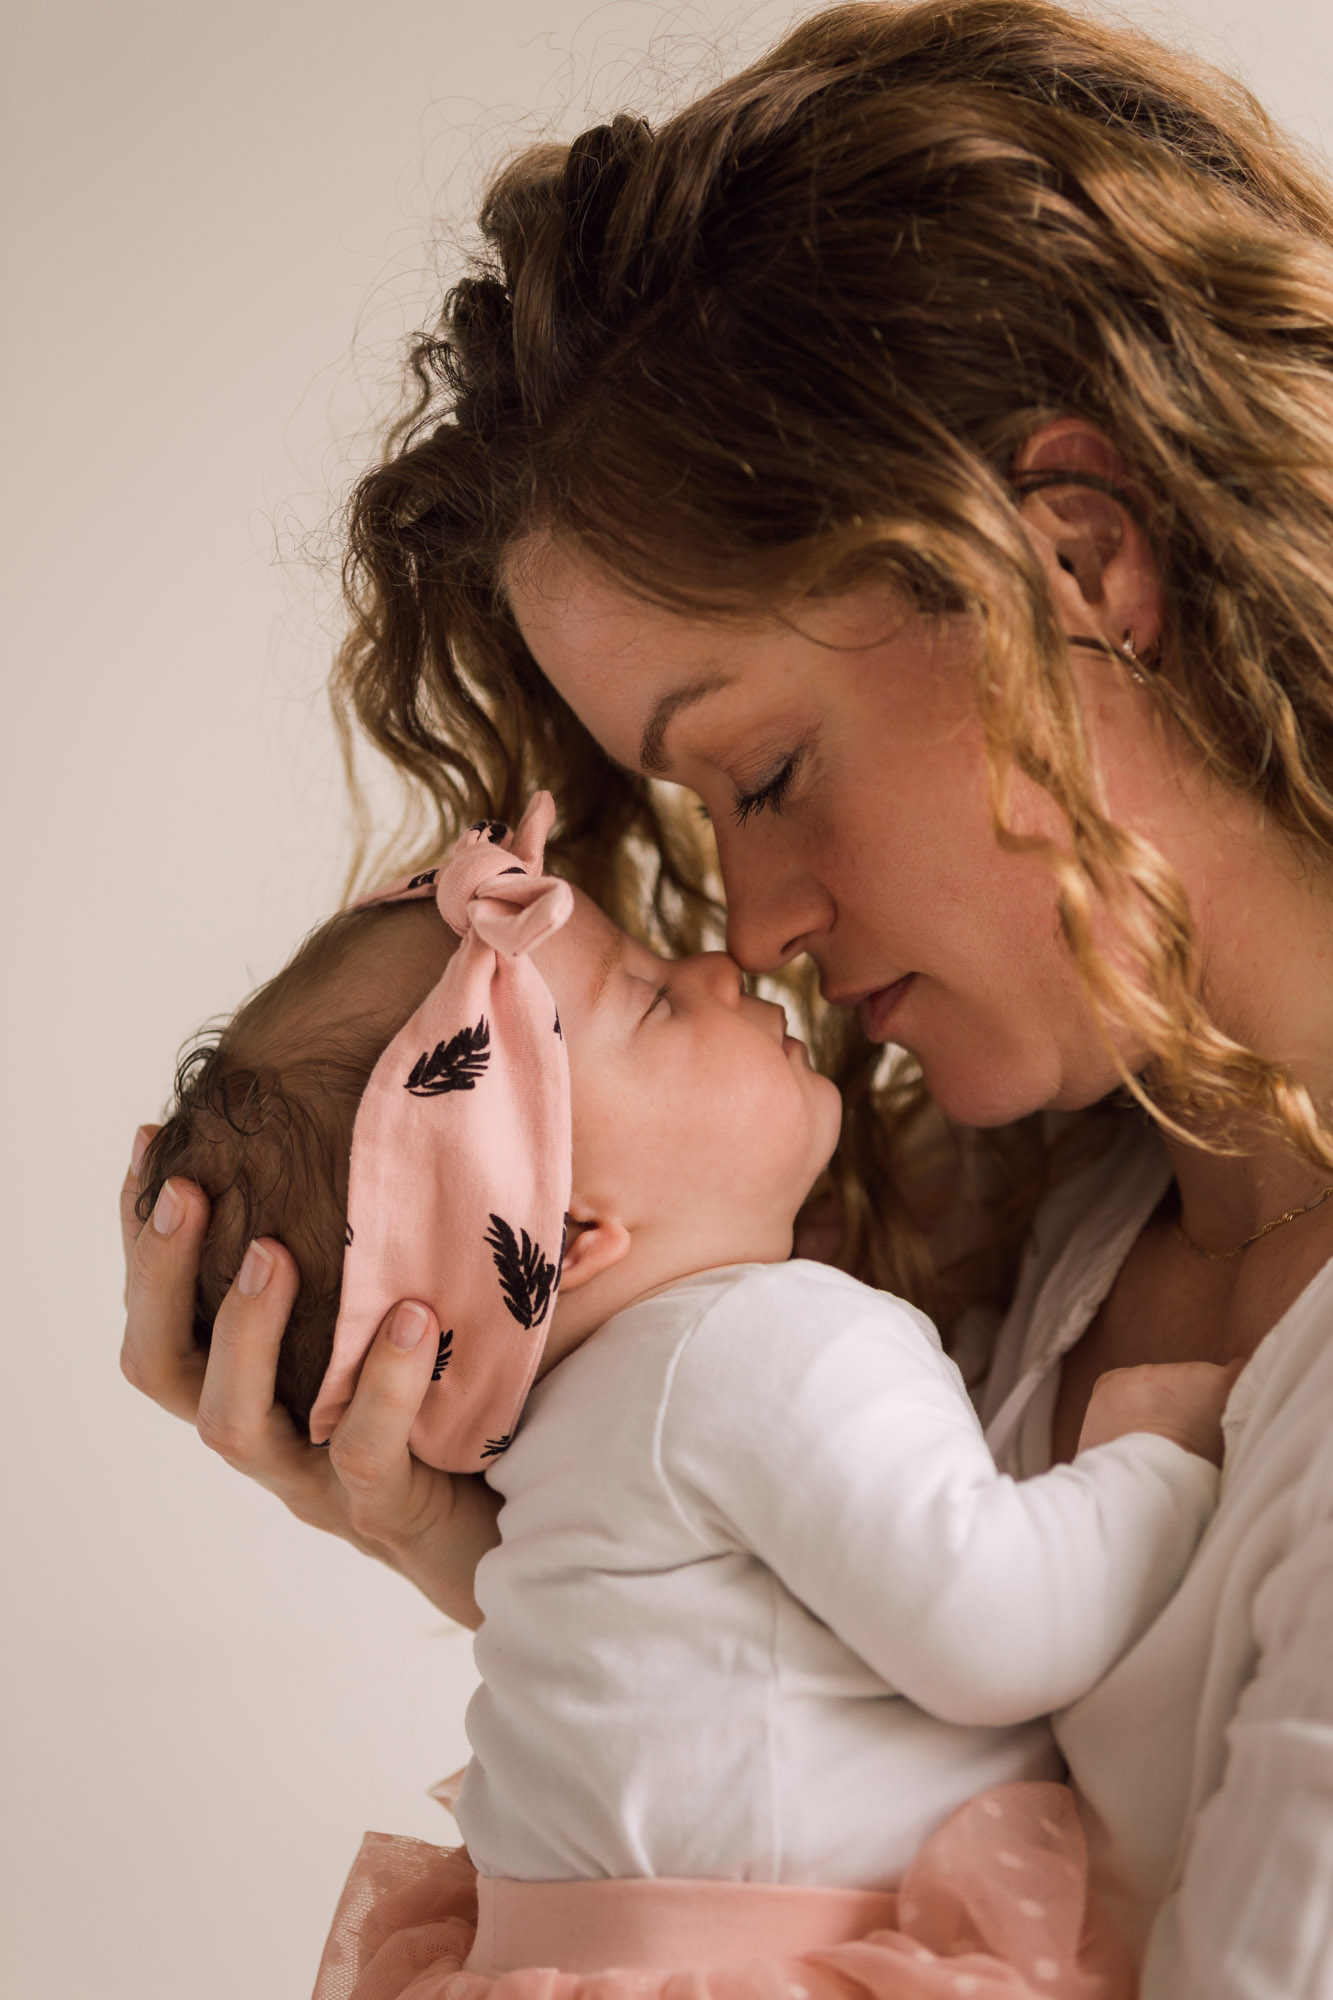 Newborn lifestyle fotografie. Newborn lifestyle foto door Mayra Fotografie. Fotograaf Amersfoort. Fotograaf Nijkerk. Fotograaf Hoevelaken.